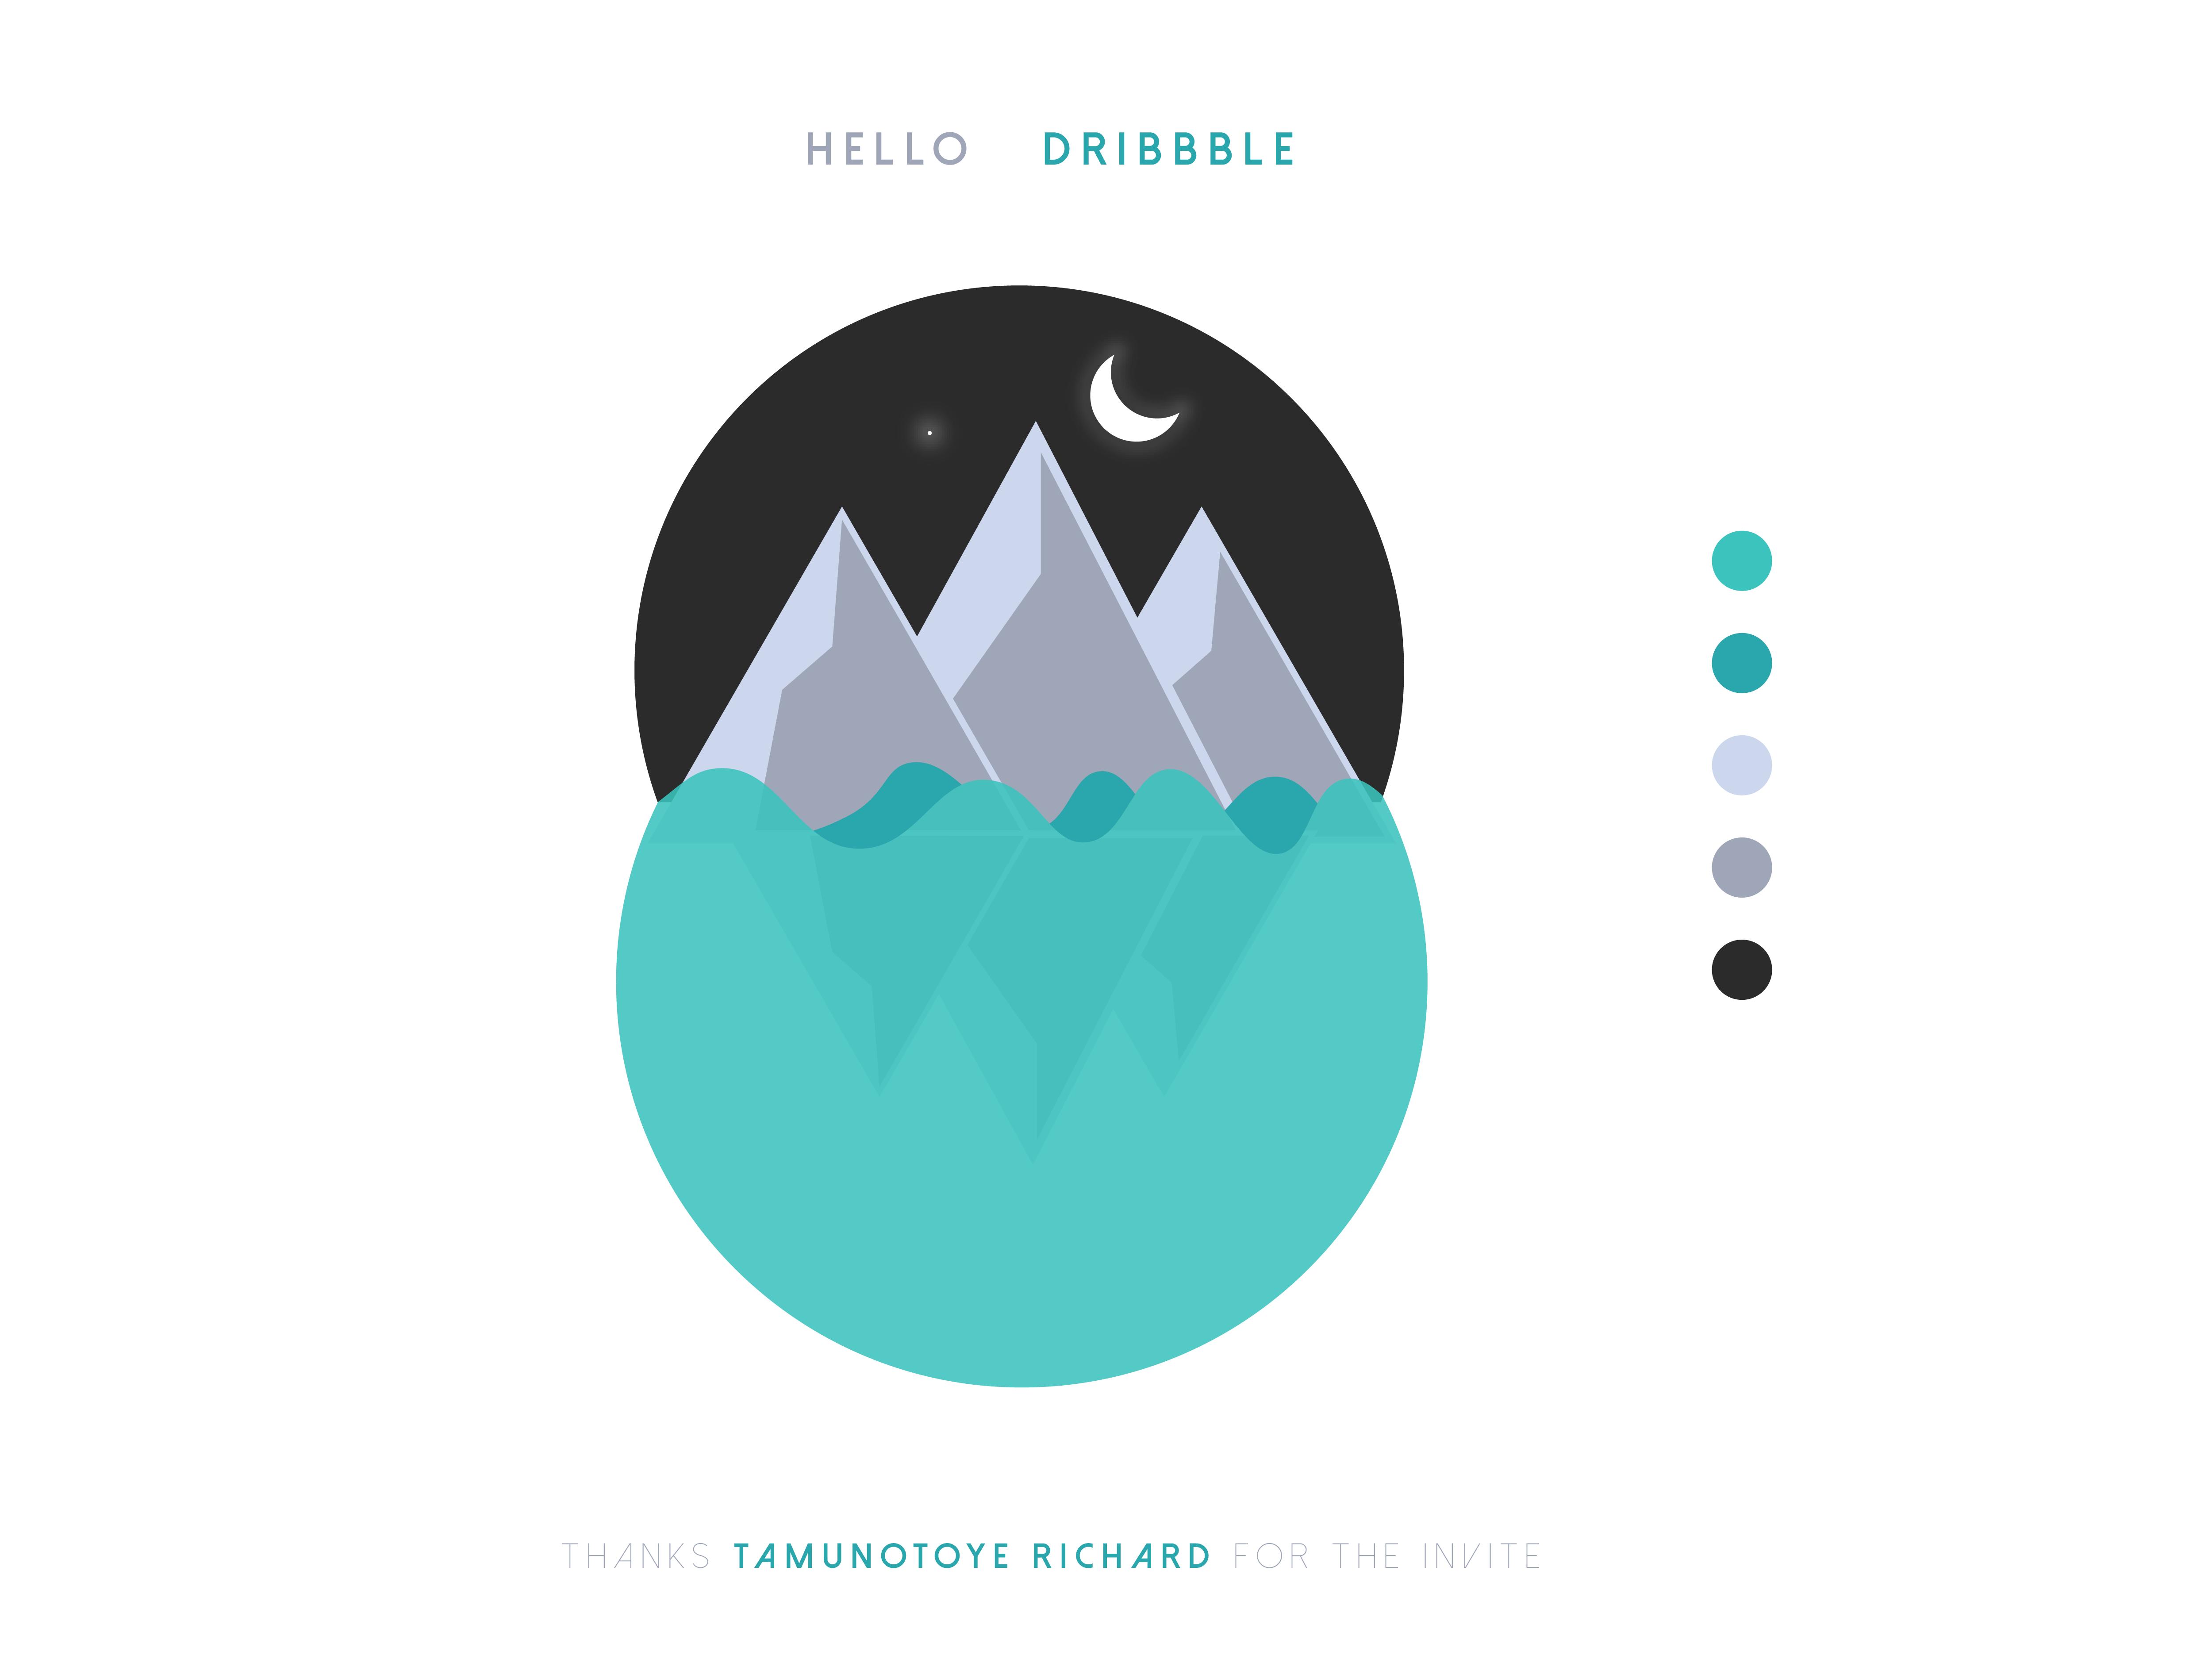 Dribble 01